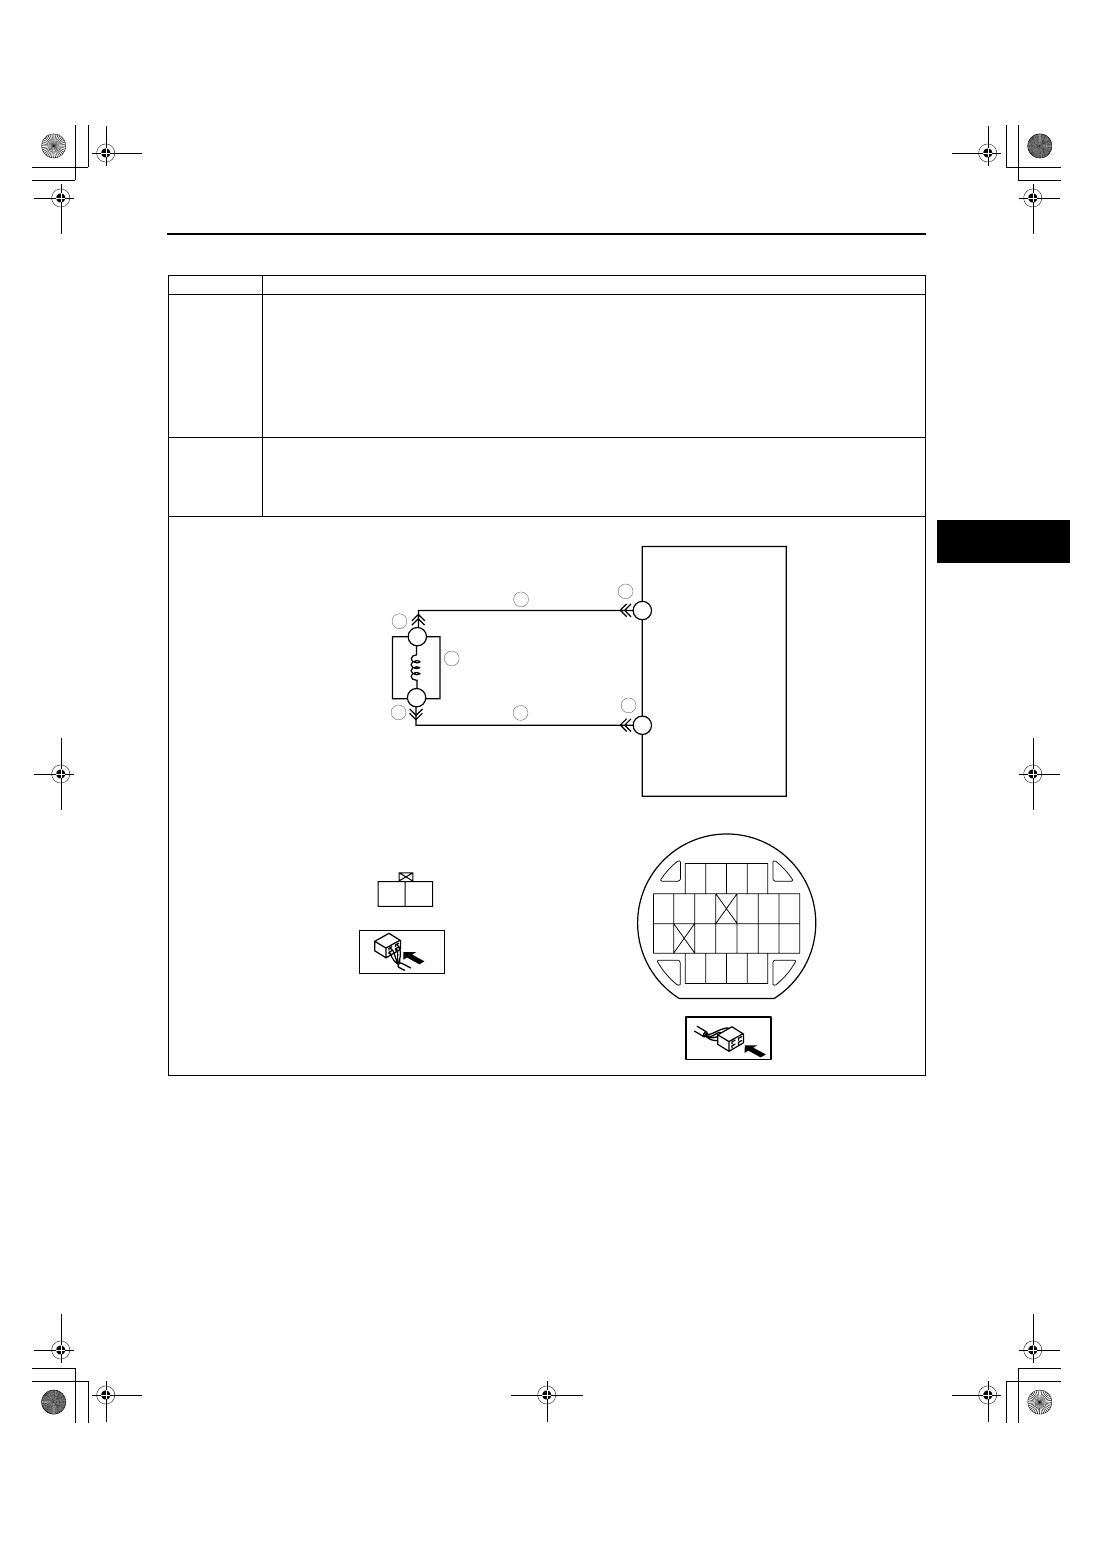 Mazda Cx 7 Manual Part 238 B17 Wiring Harness